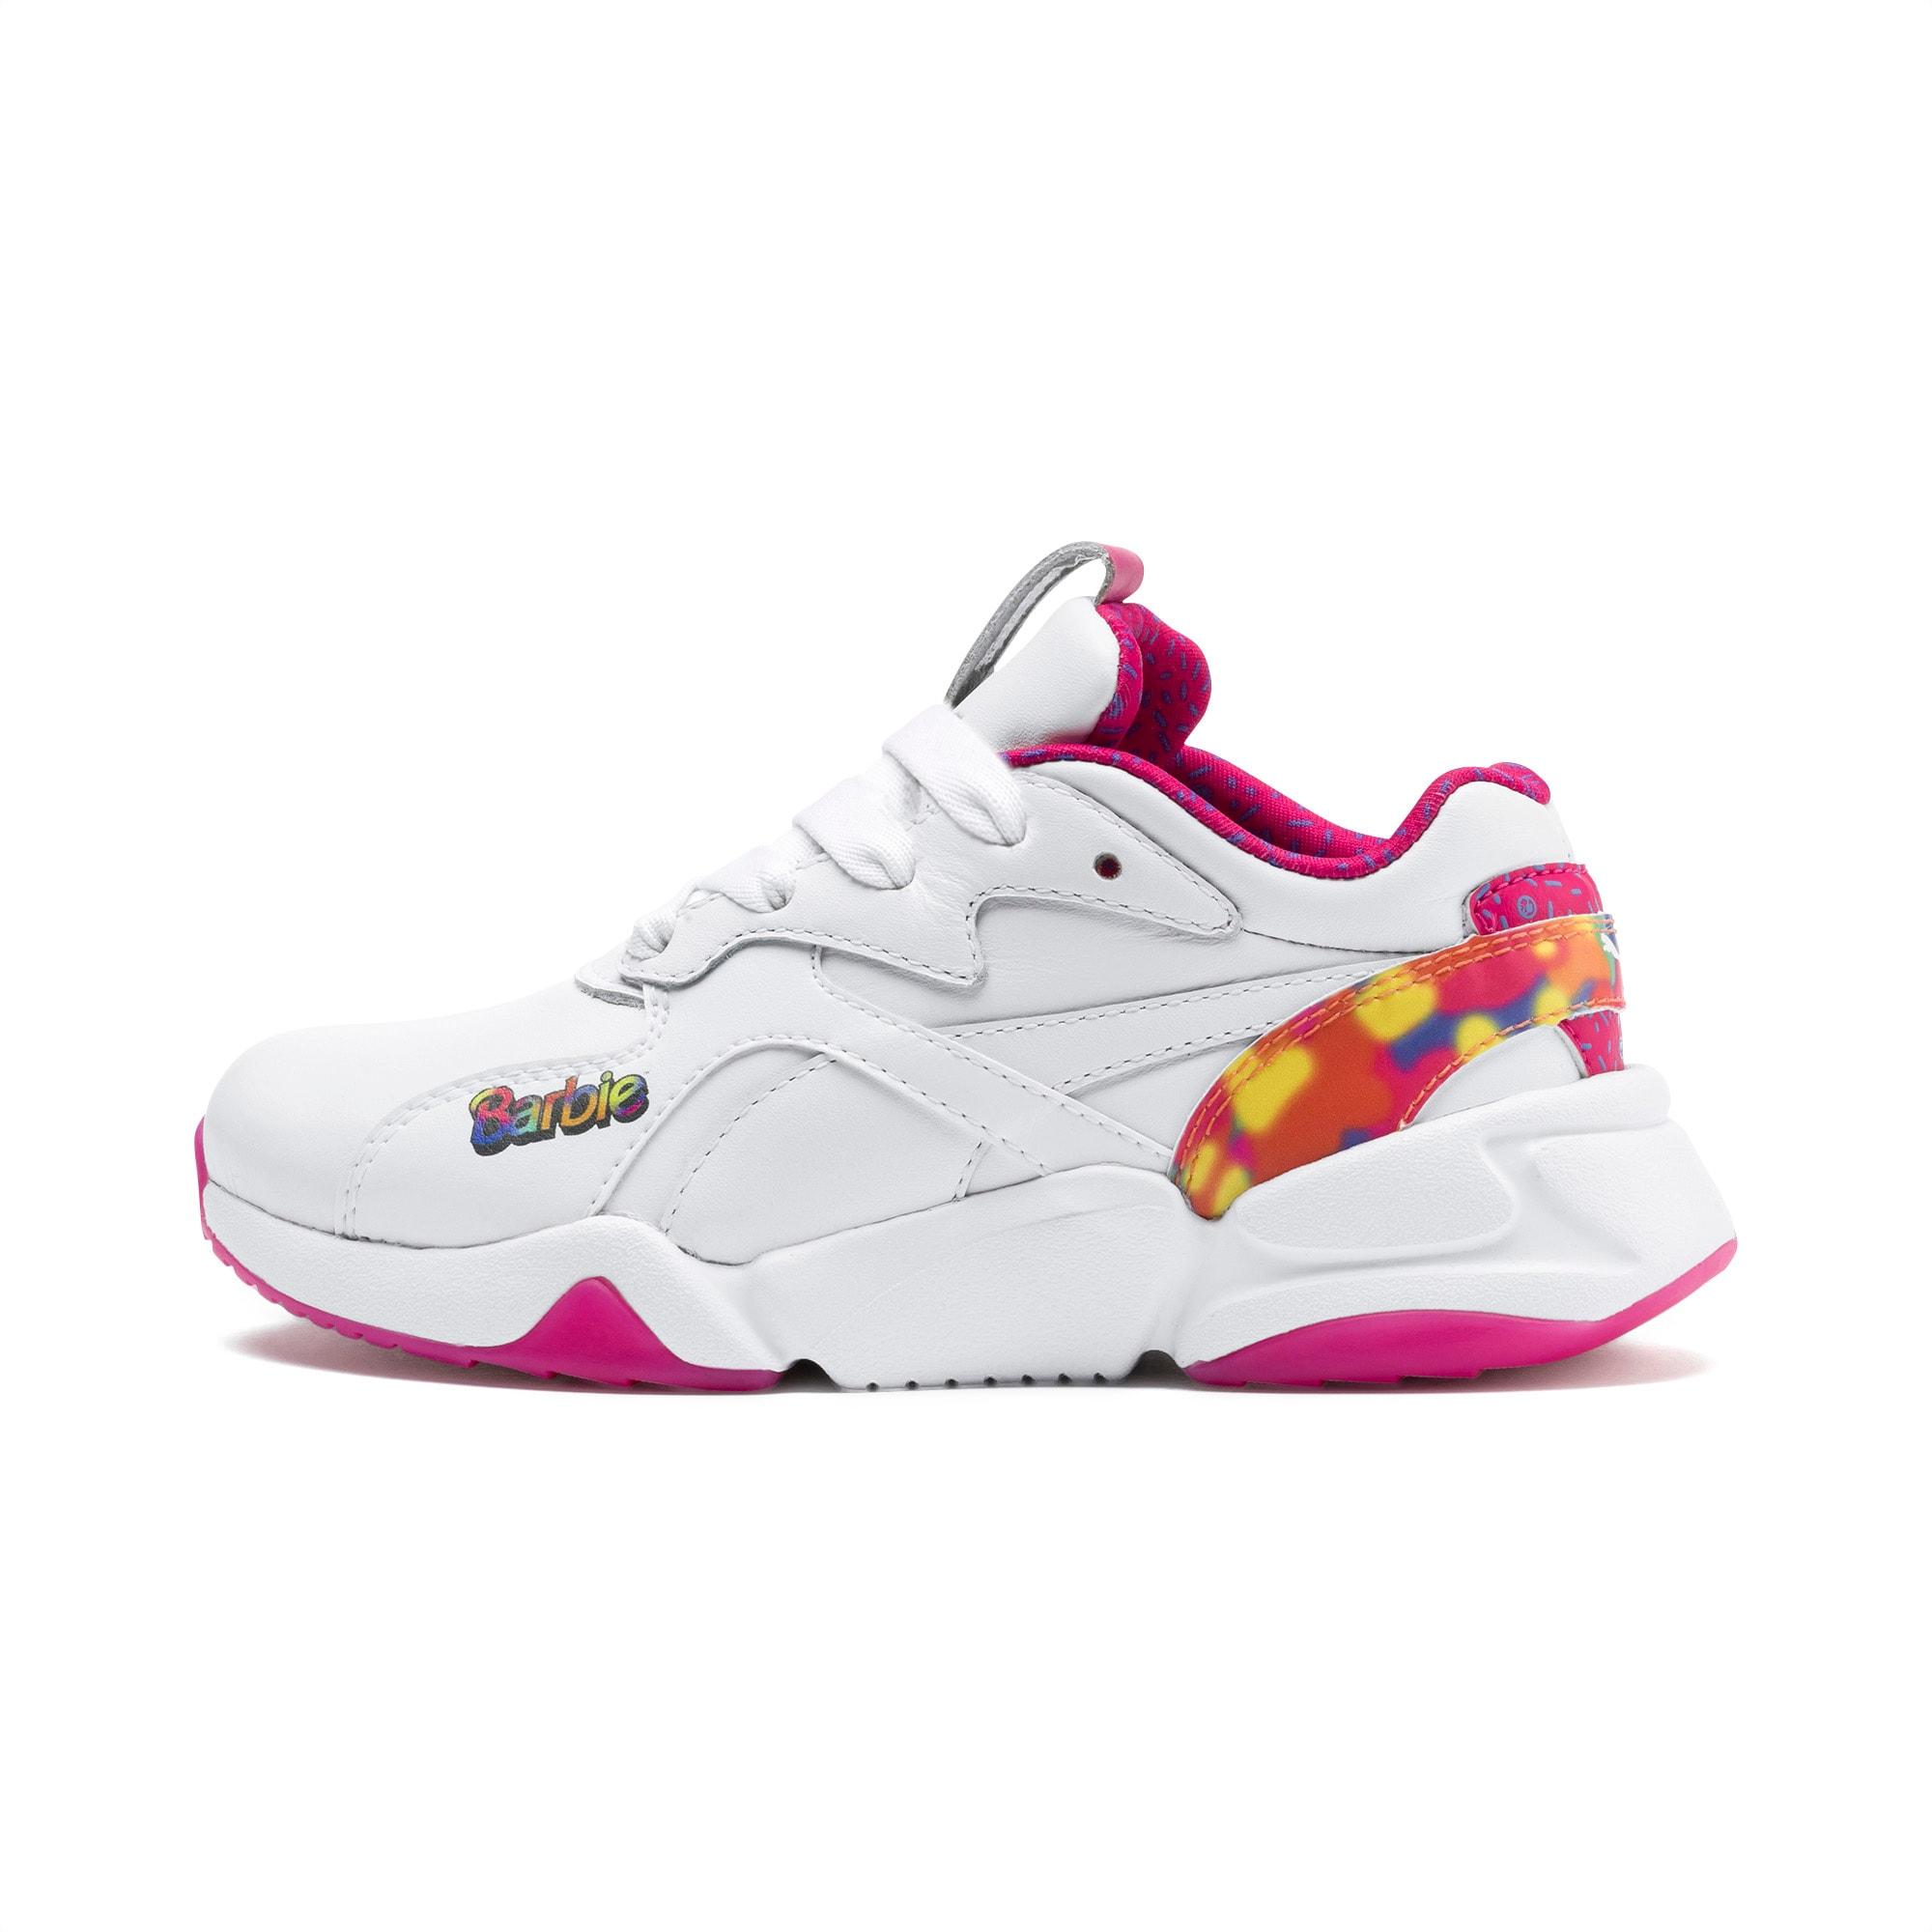 PUMA x BARBIE Nova Flash Little Kids' Shoes